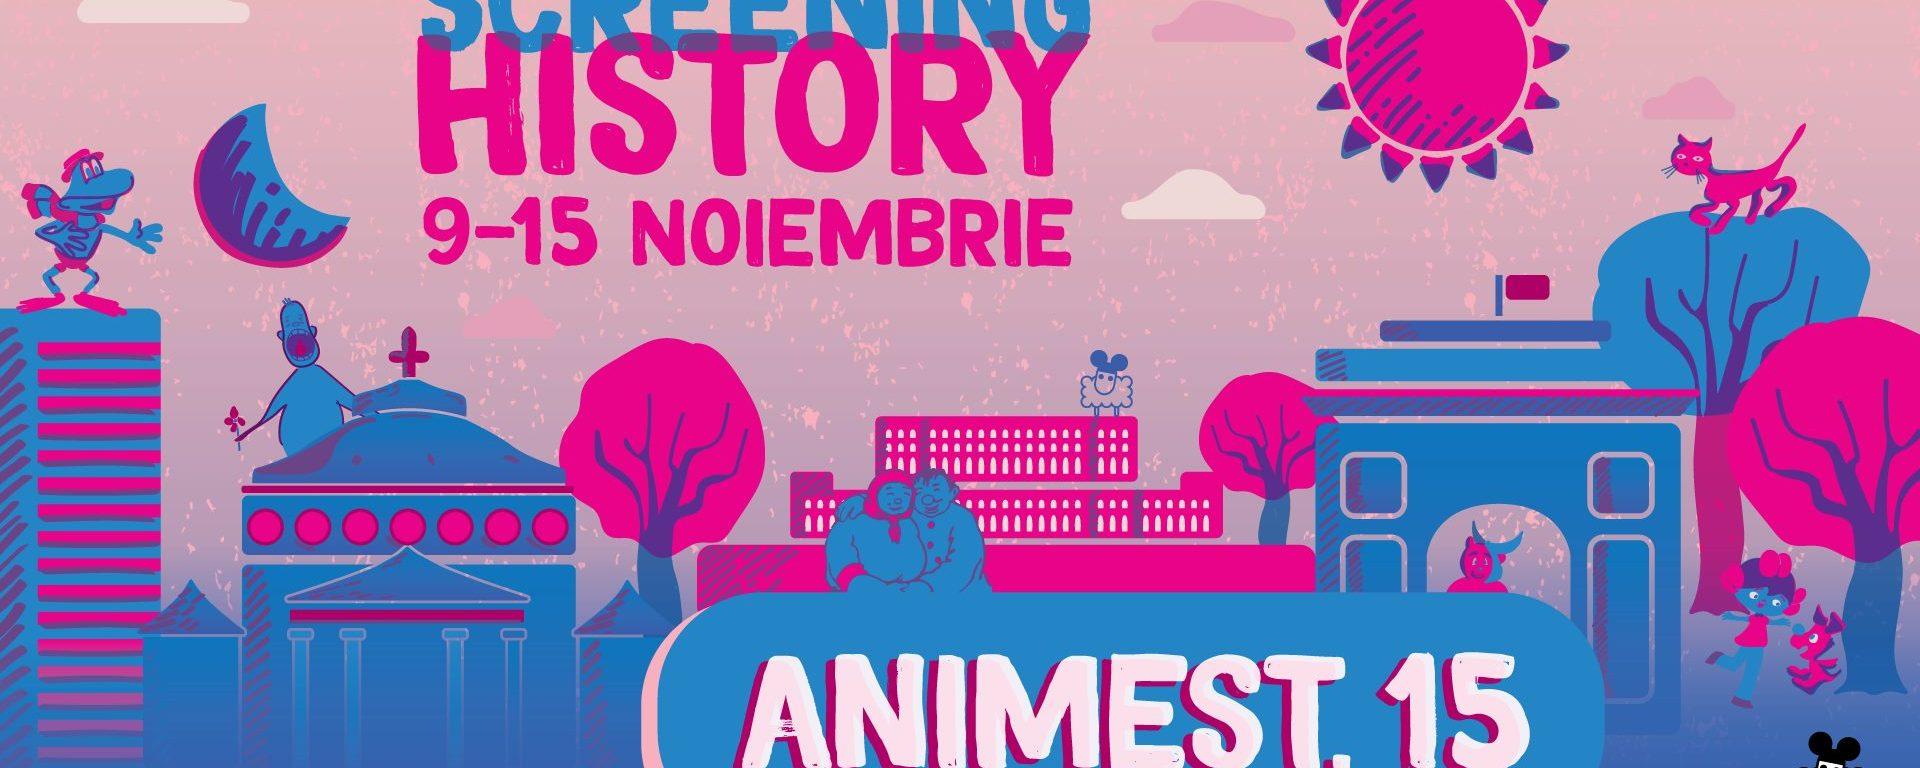 Animest.15 #ScreeningHistory - 9 Noiembrie